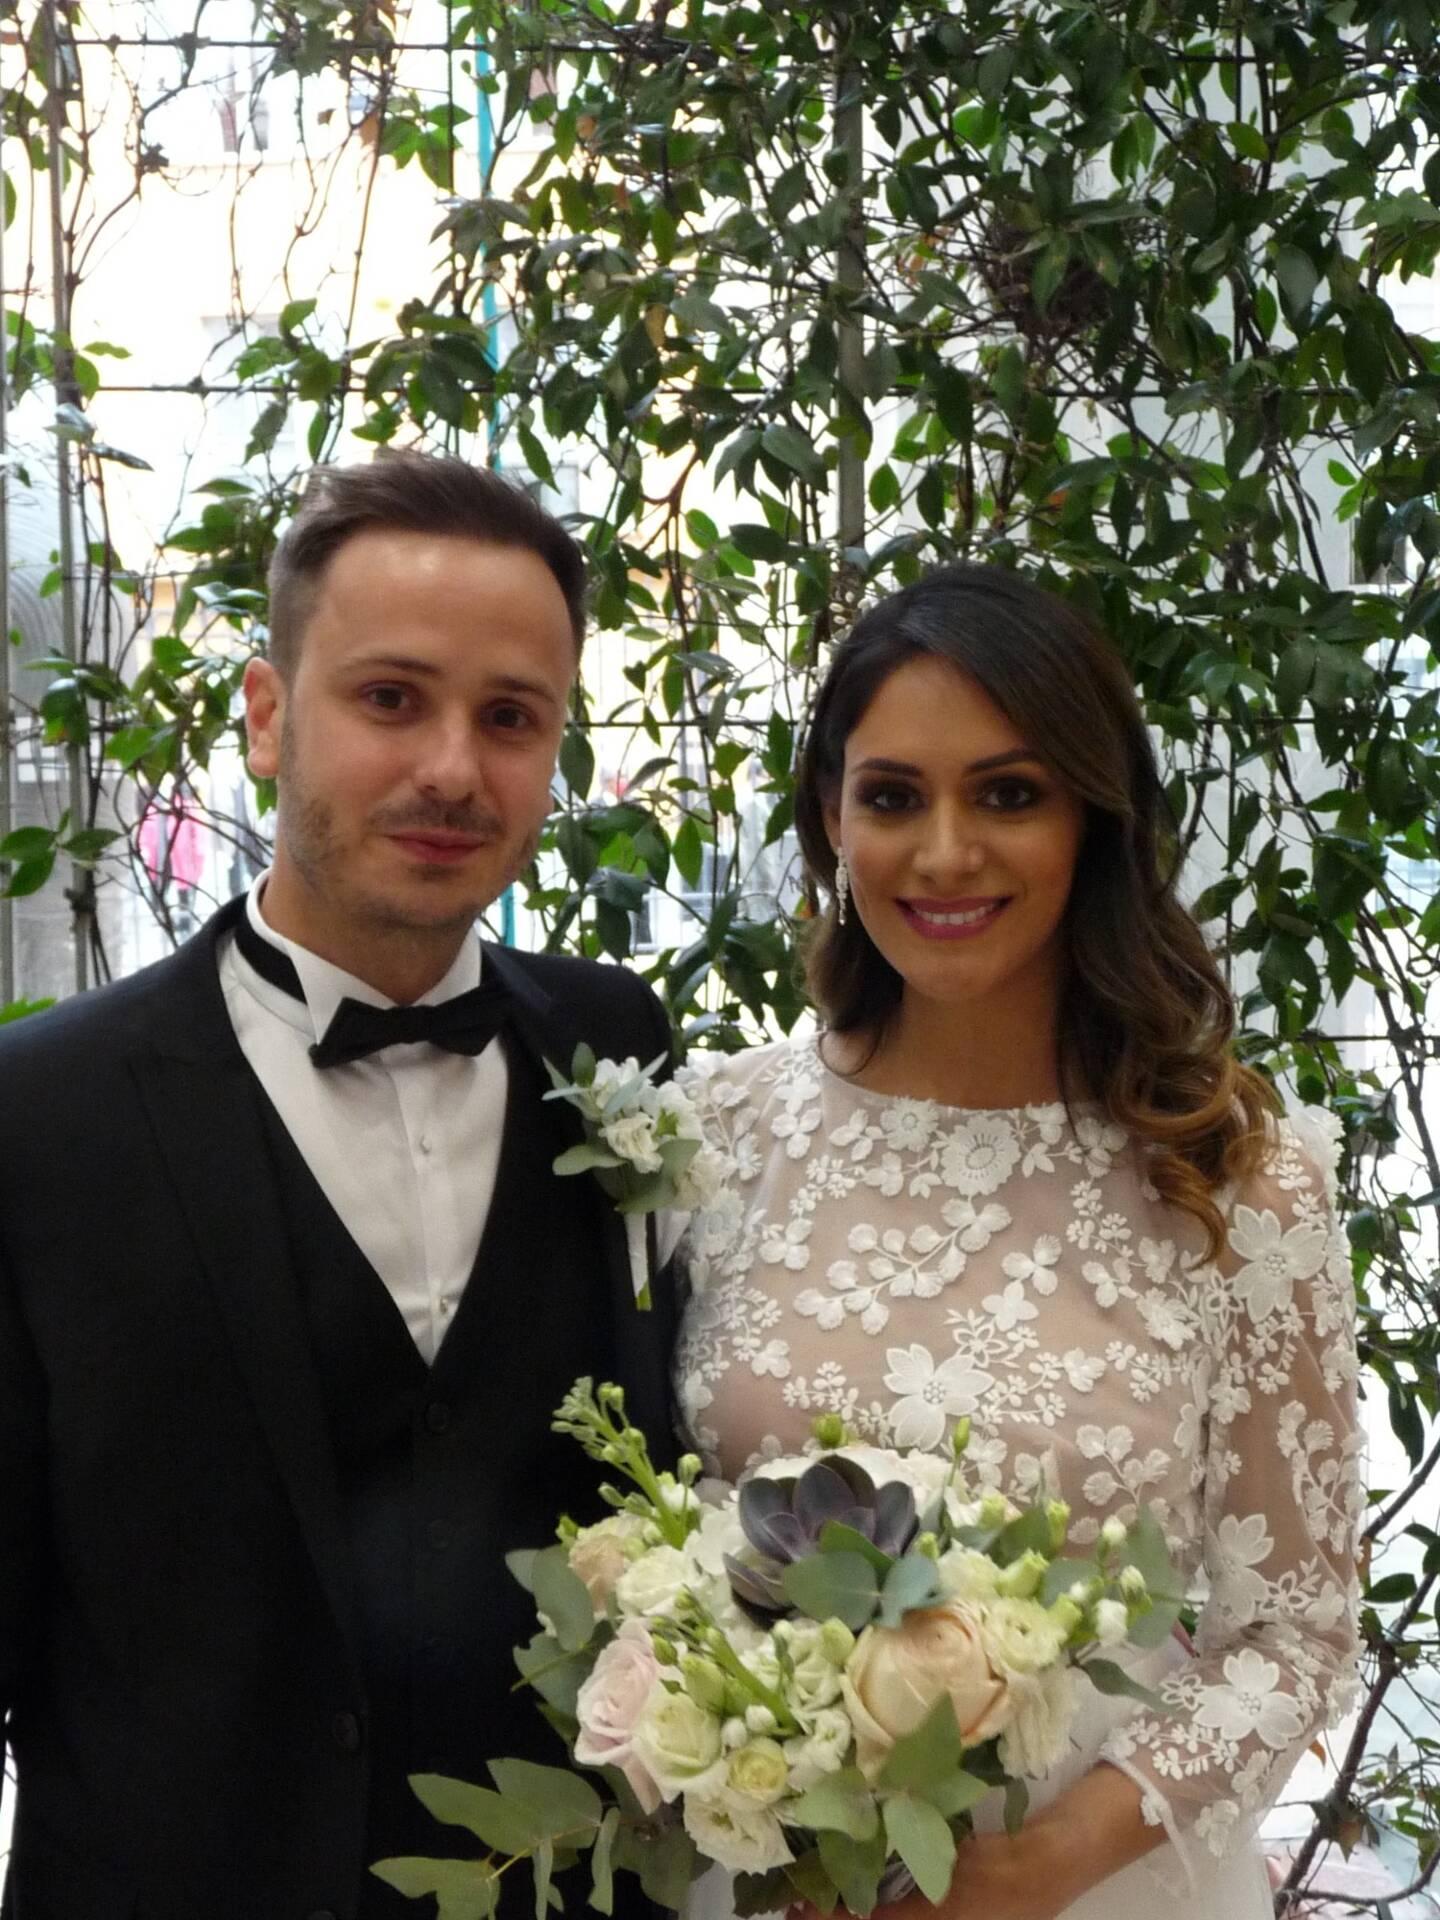 Anthony Correia-Prazeres, consultant, et Angela Castro-Heredia, agent de voyages.